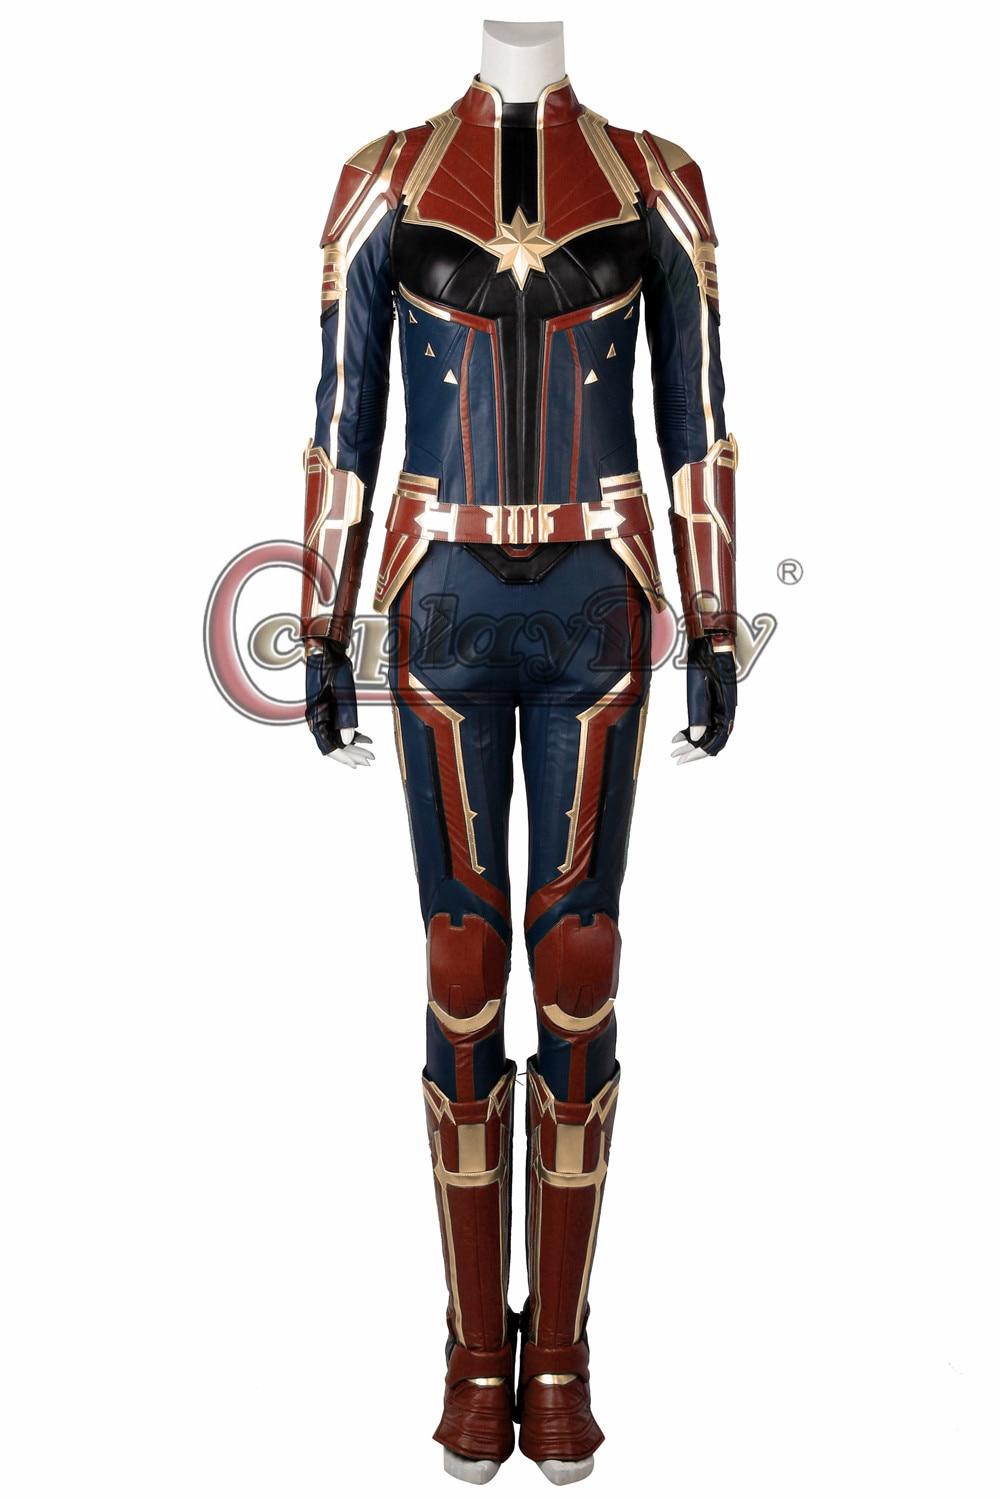 Cosplaydiy Captain Marvel Cosplay Ms Marvel Carol Danvers Costume Jumpsuit Outfit Halloween Adult Women Full Set Brie larson in captain marvel. sistastore